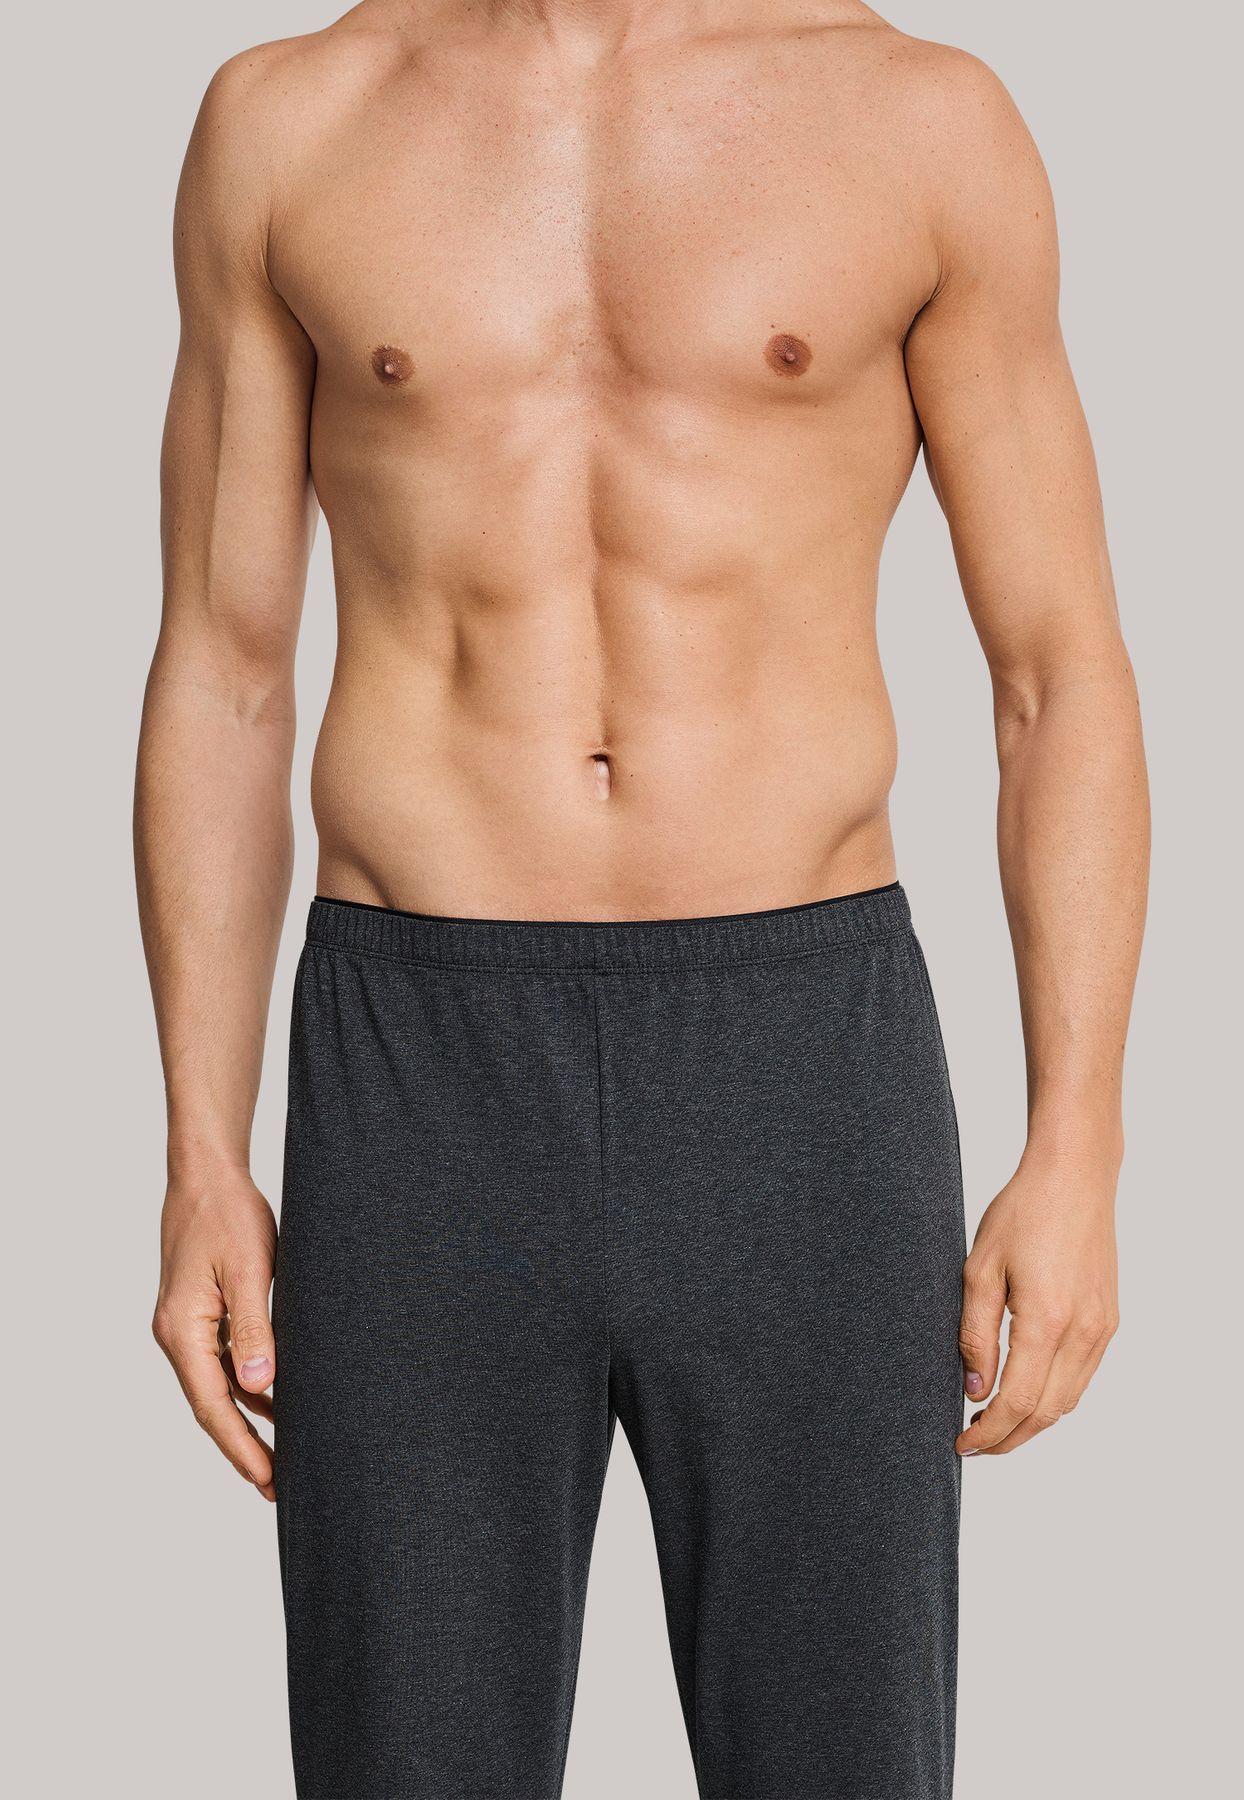 Schiesser - Herren Schlafanzug lang - Jersey Jacquard anthrazit - Long Life Soft (163776-203) – Bild 4